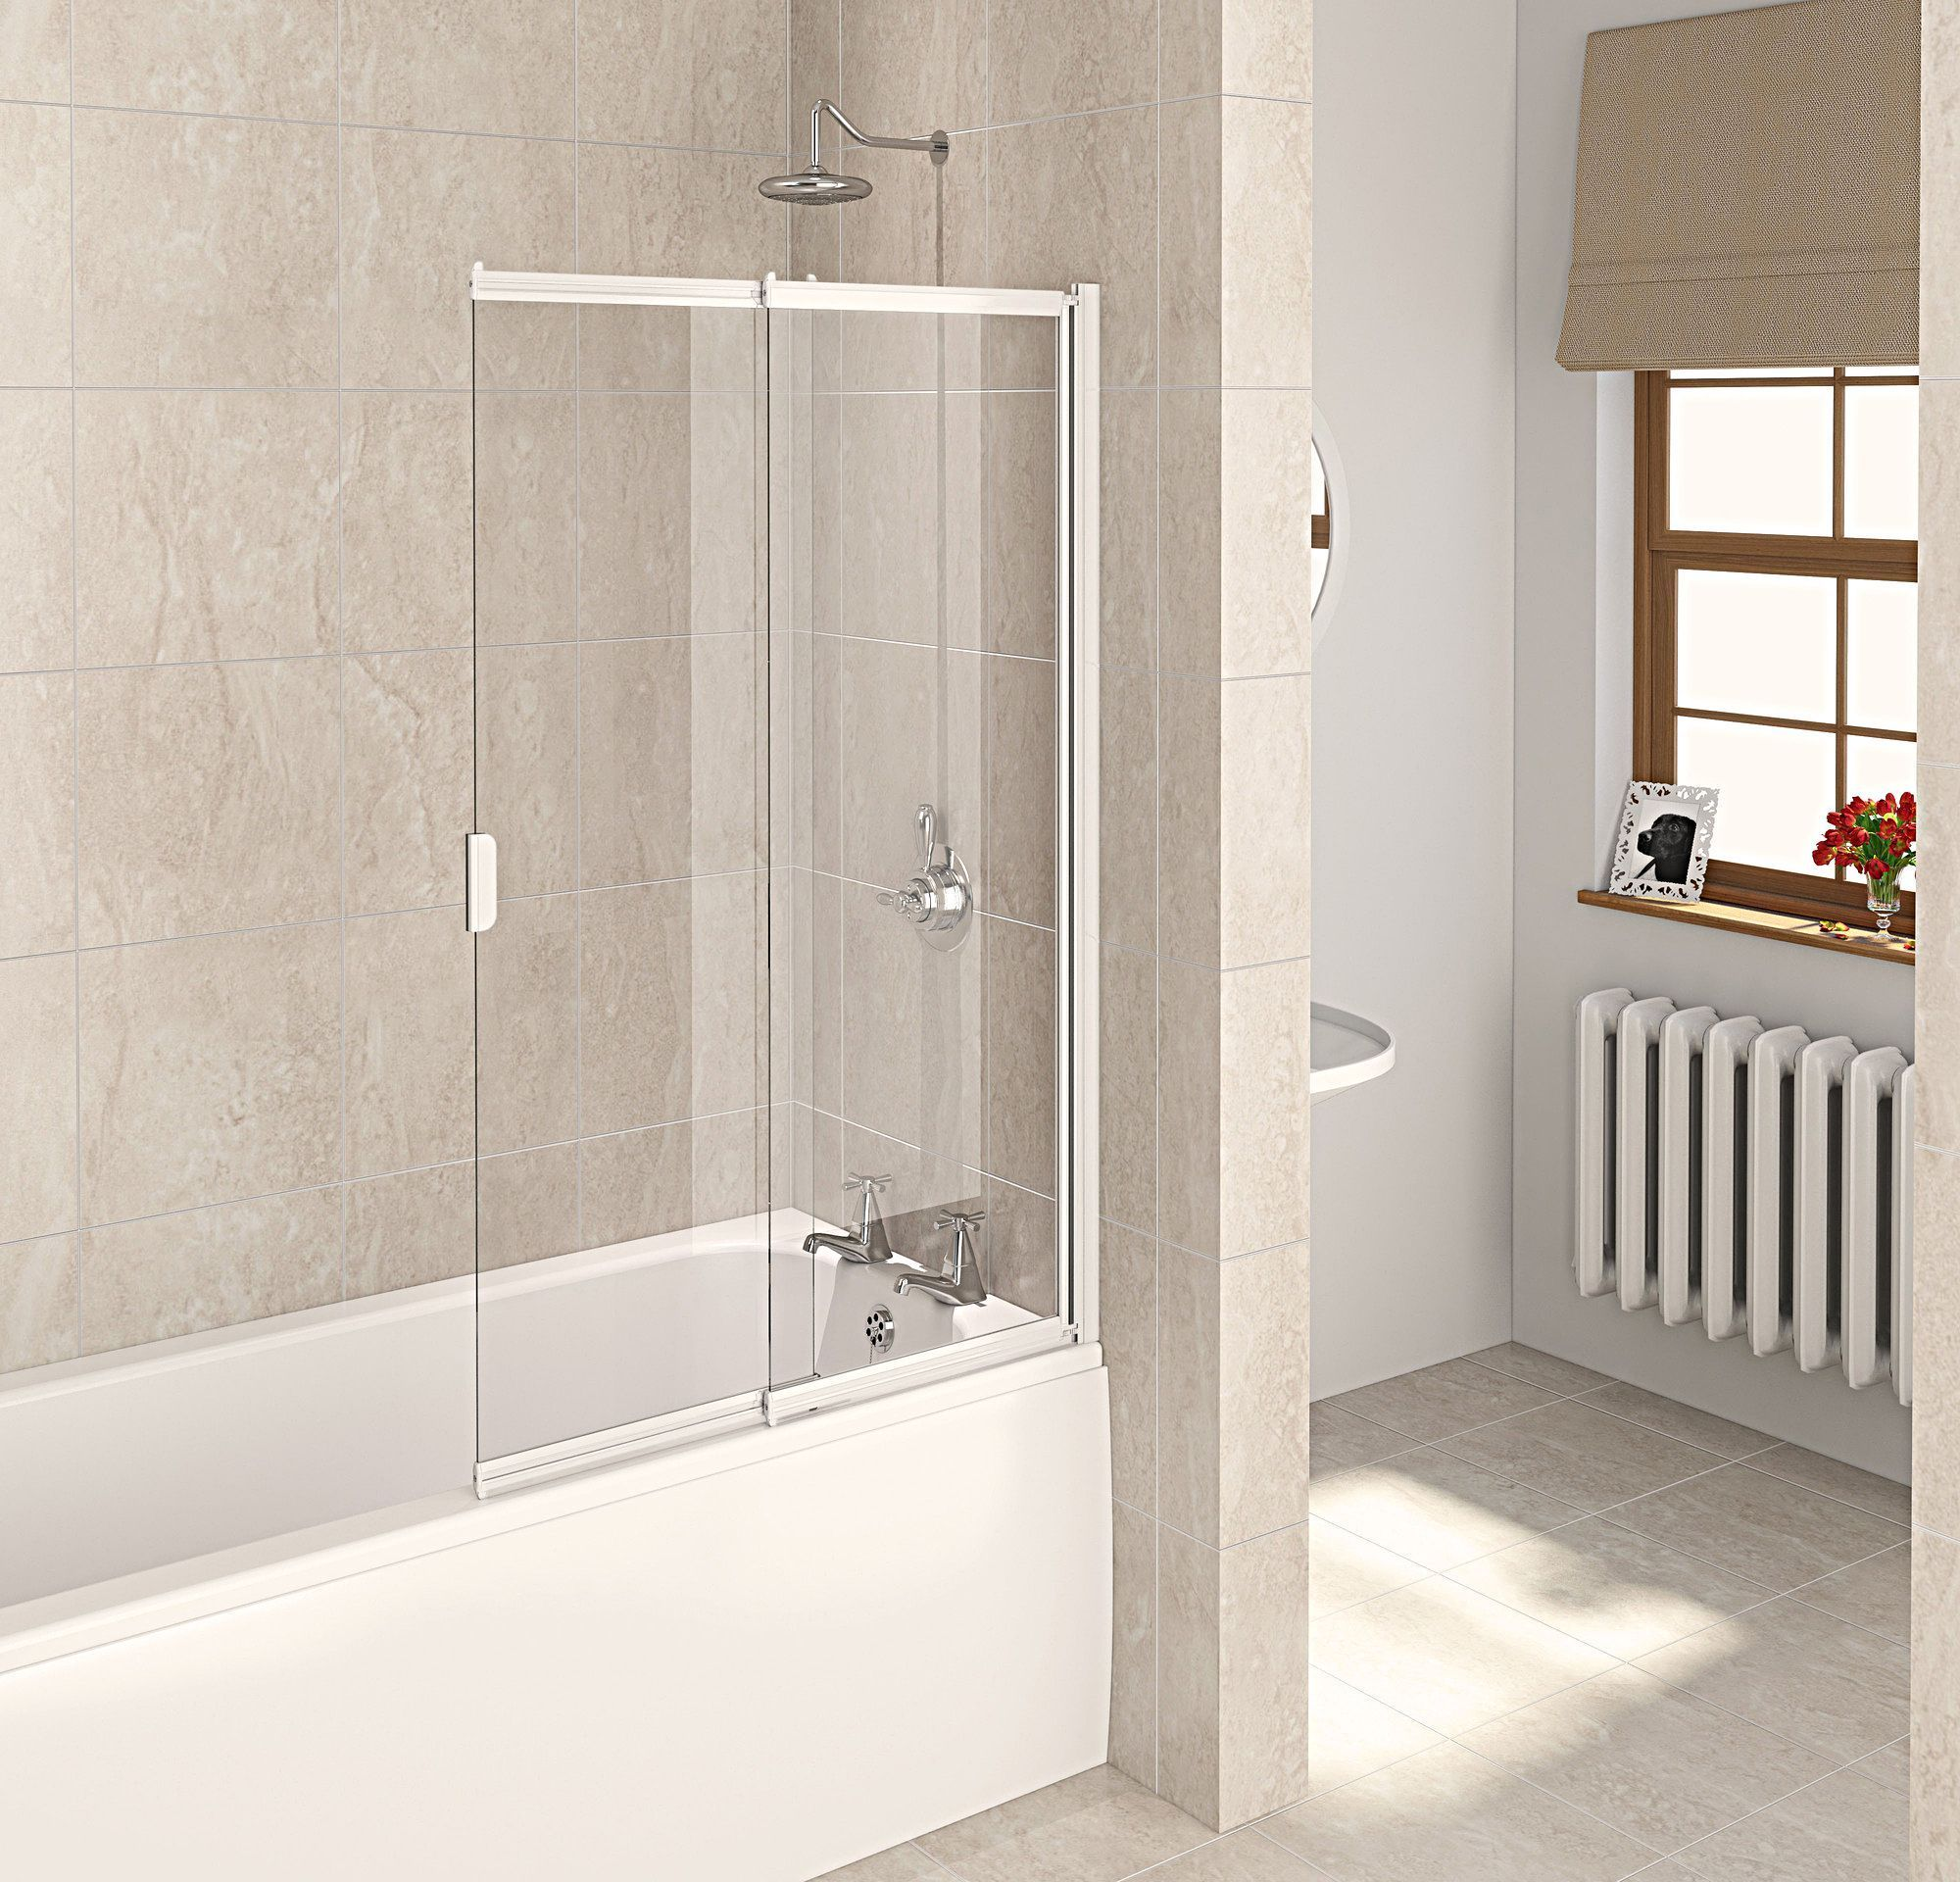 aqualux-white-aqua-4-clear-glass-2-panel-sliding-bath ...